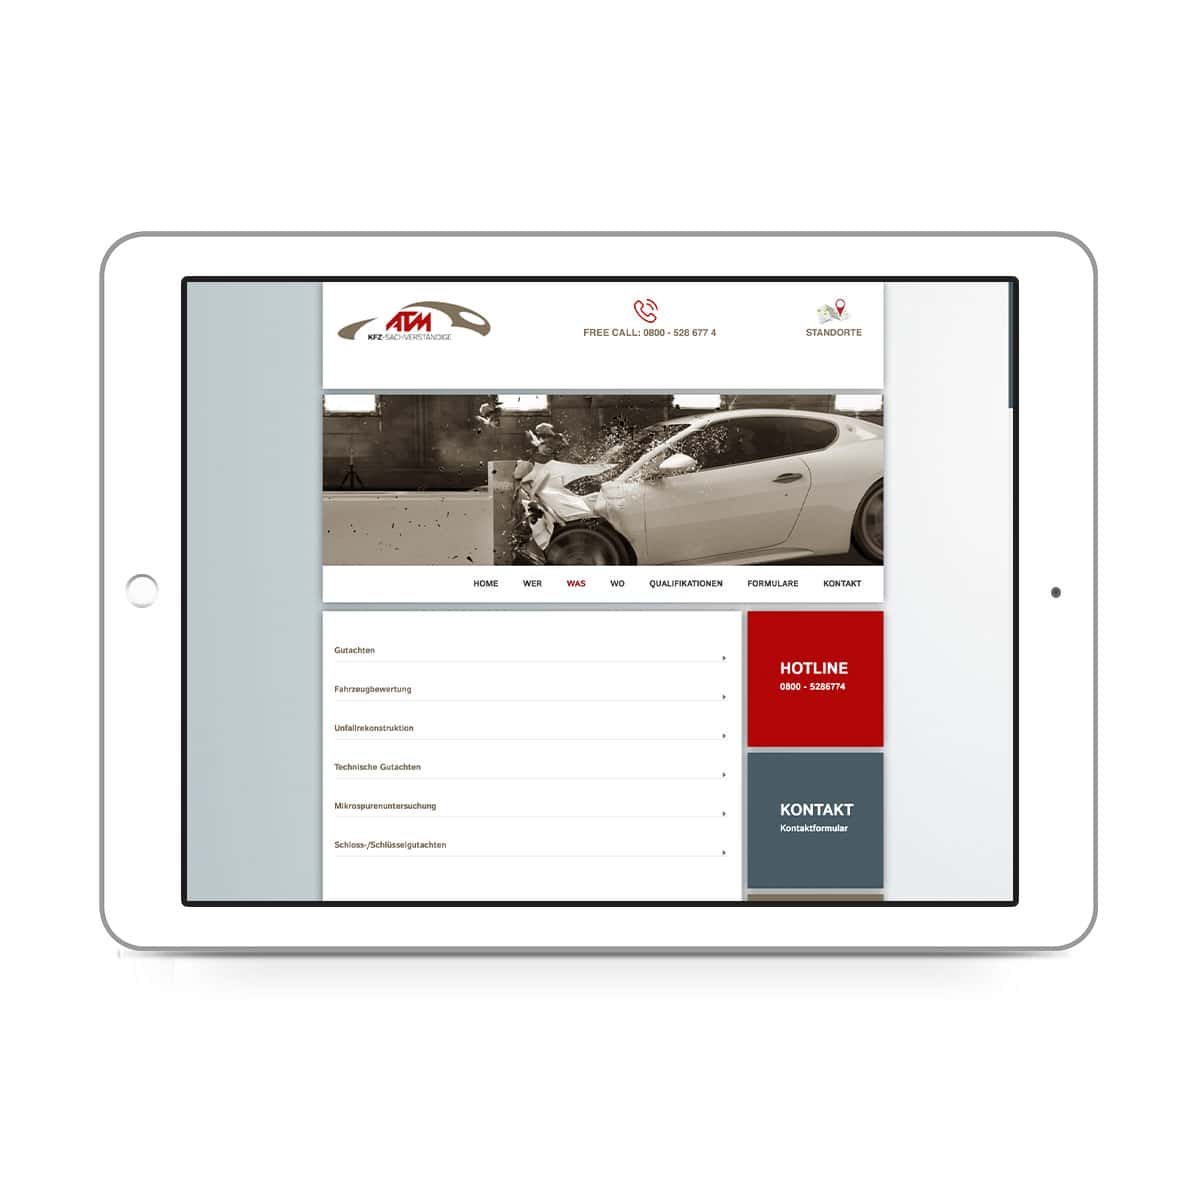 ATM-expert Dipl.-Ing. Staisch GmbH - Leistungen